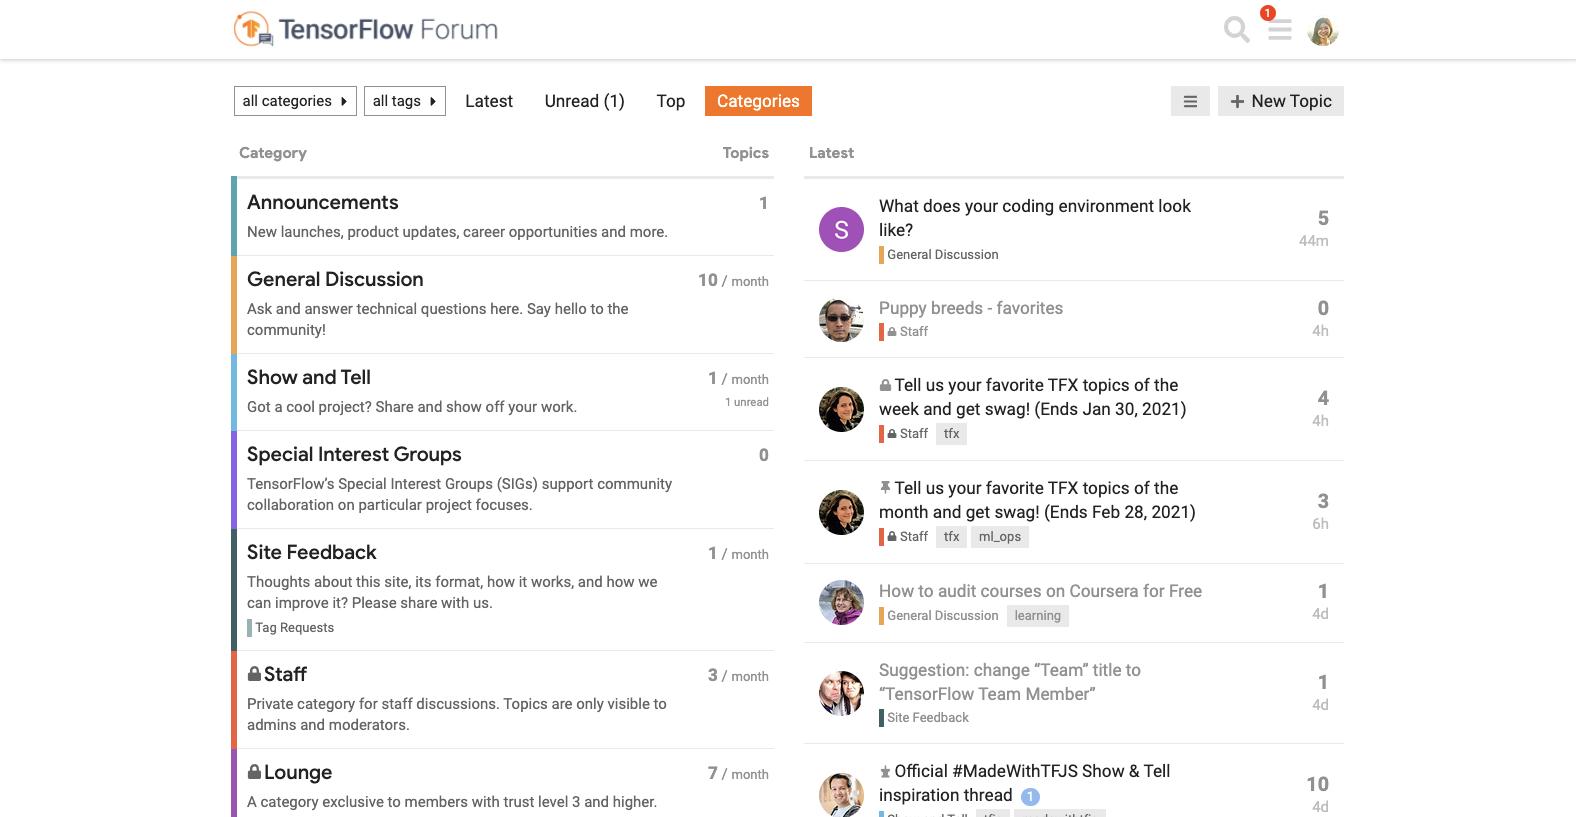 TensorFlow Forum page